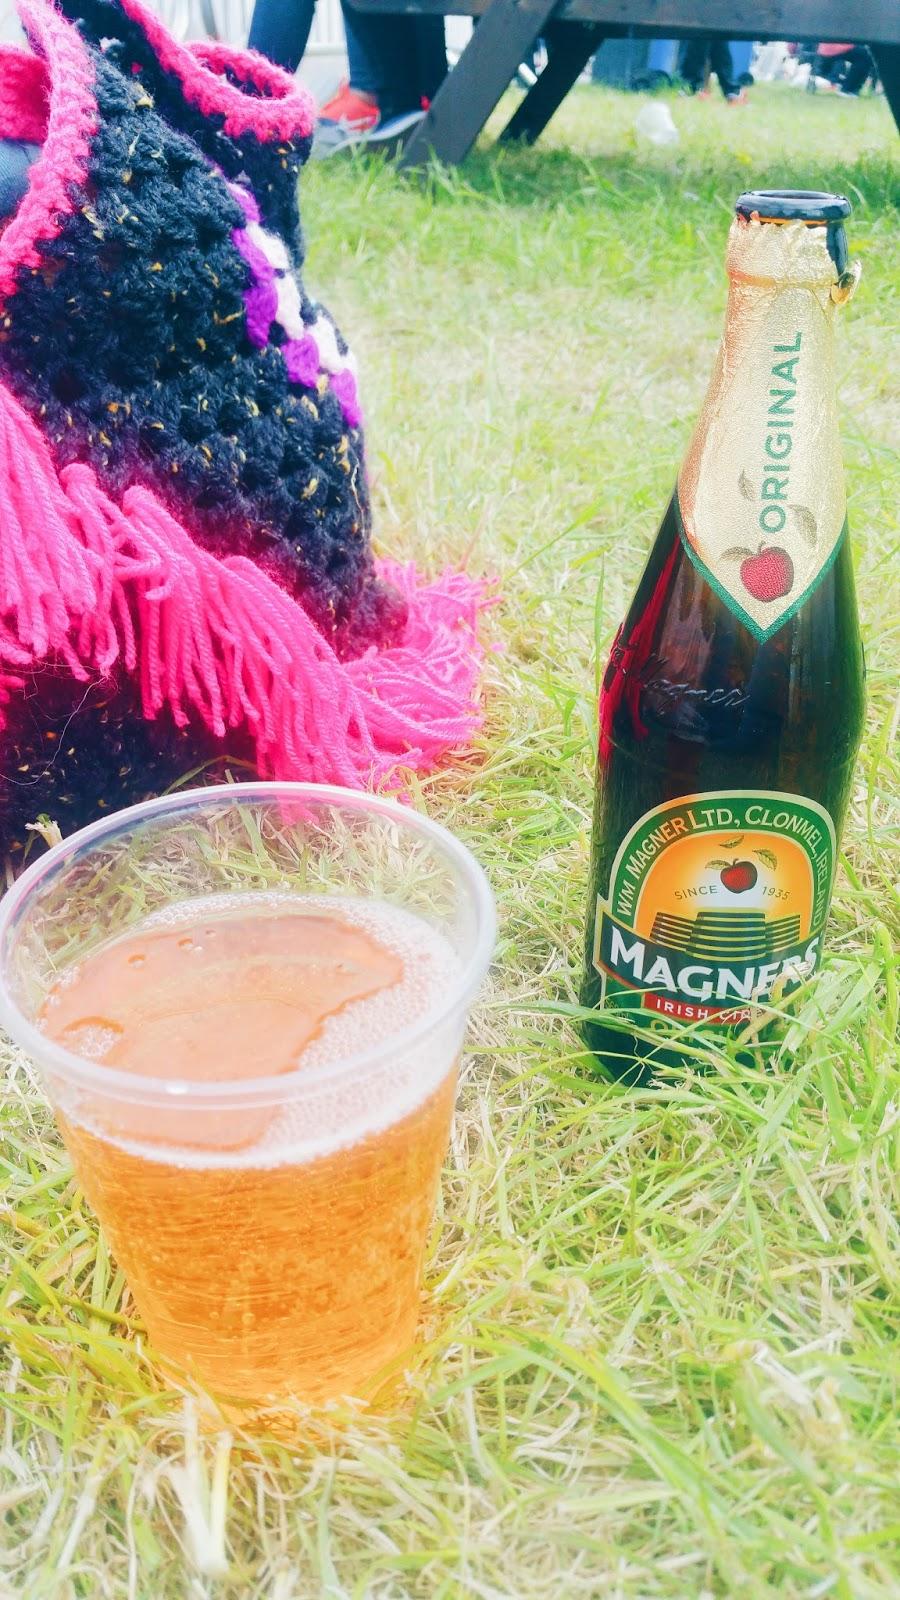 magners cider wheatsheaf pub crick boat show